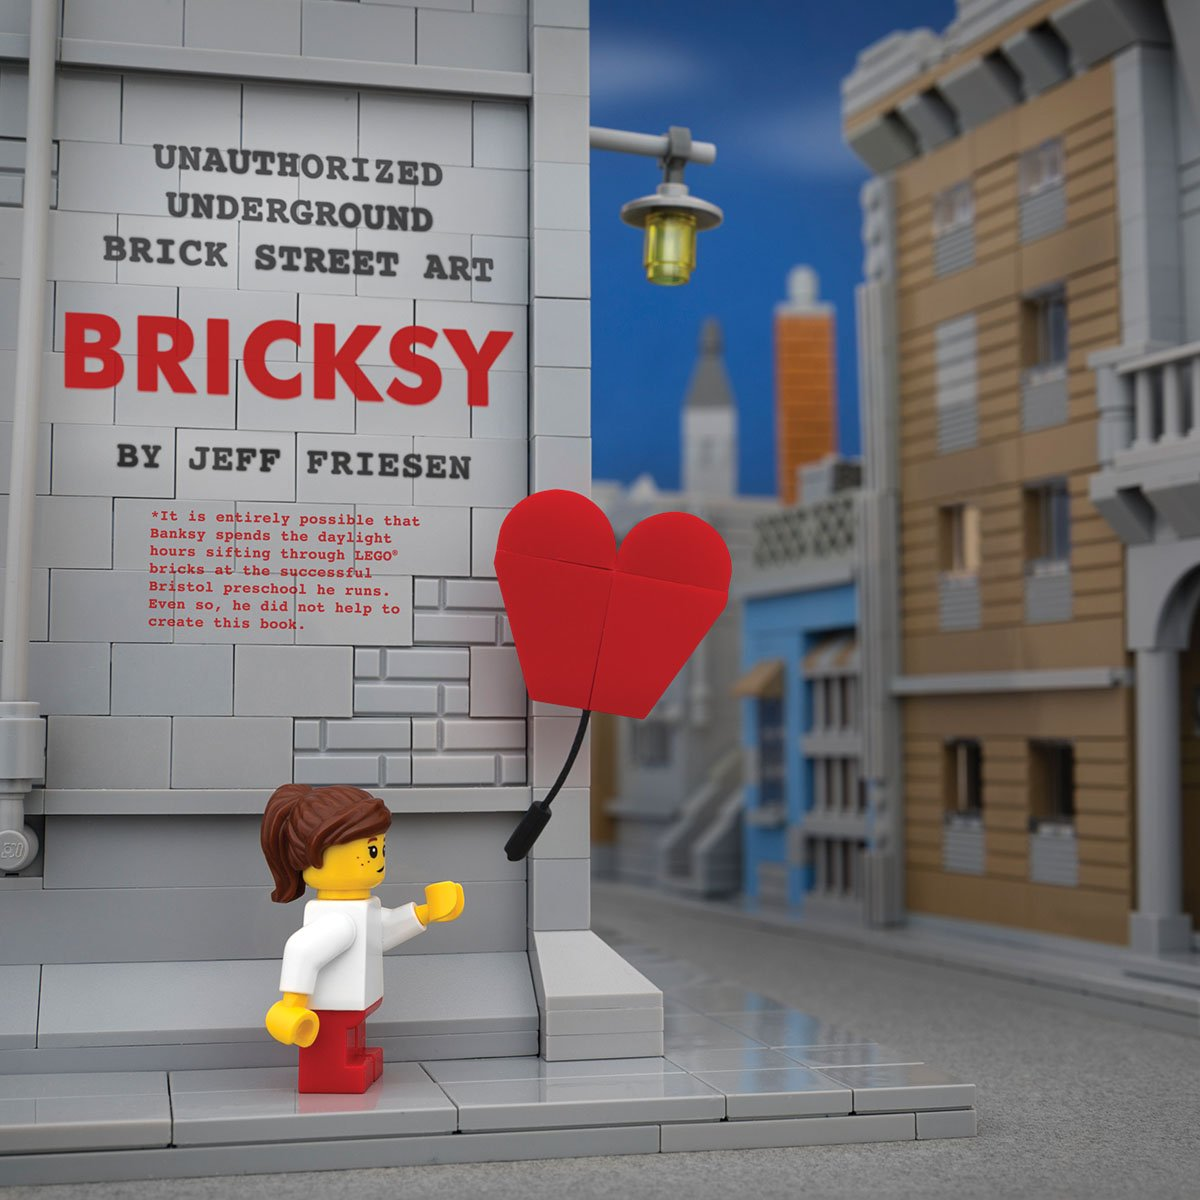 Bricksy: Unauthorized Underground Brick Street Art pdf